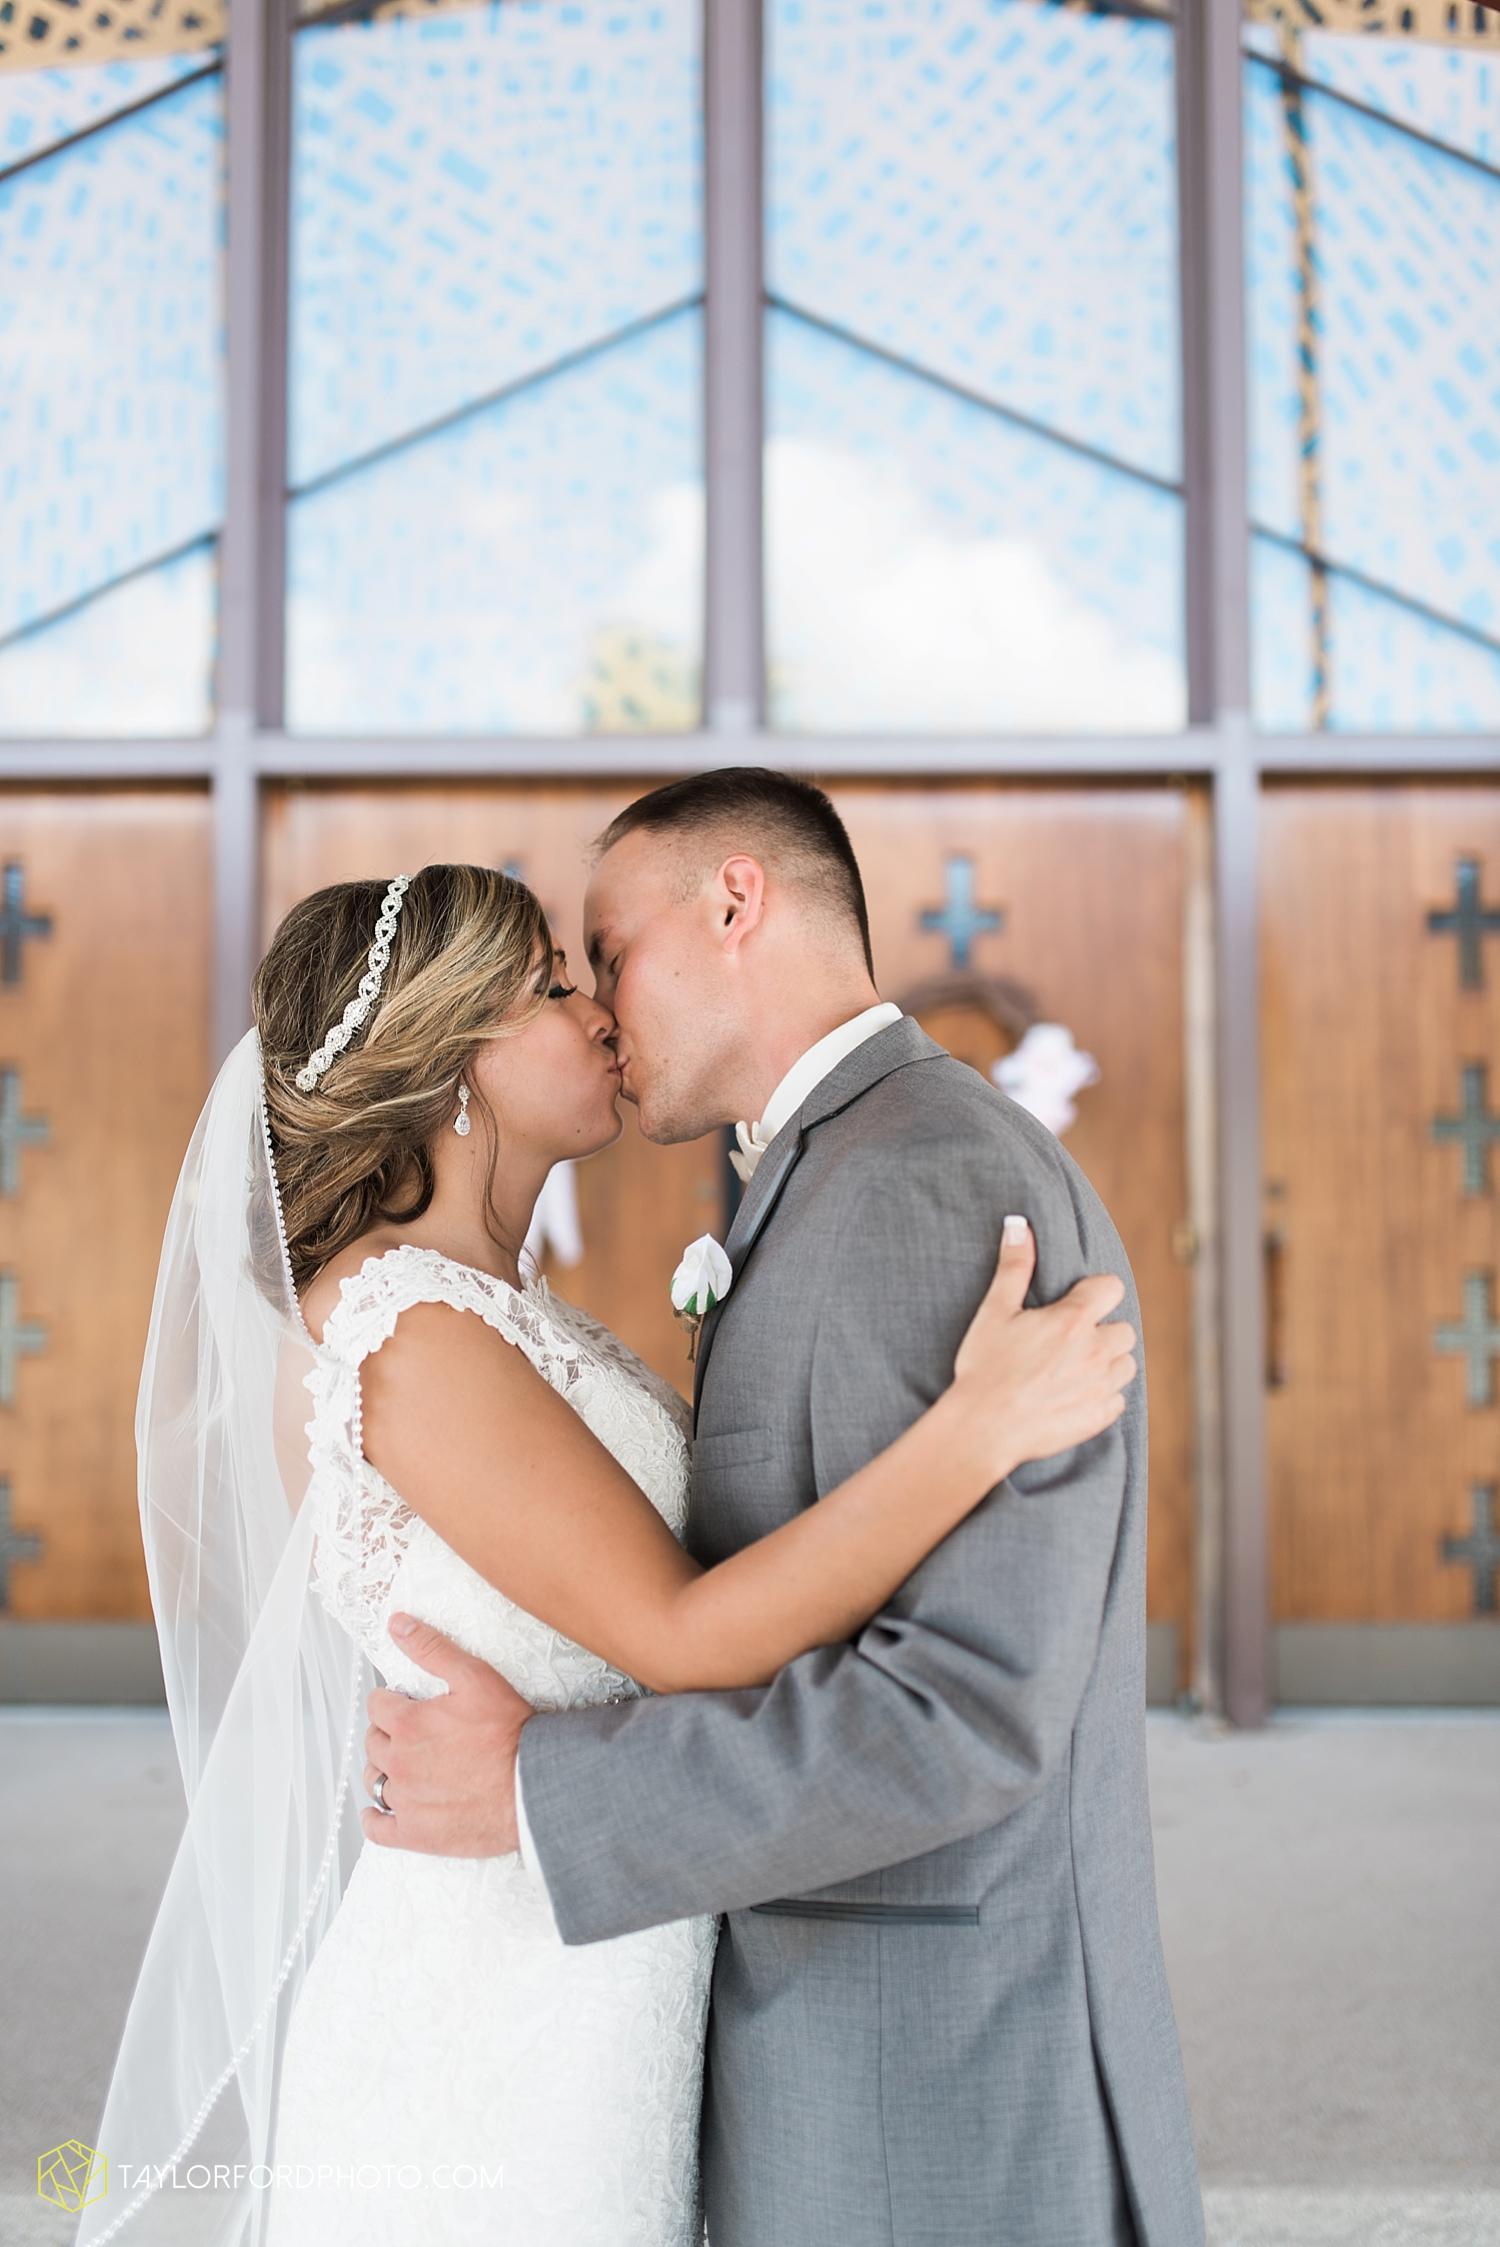 van_wert_wedding_photographer_taylor_ford_ohio_indiana_fort_wayne_2099.jpg